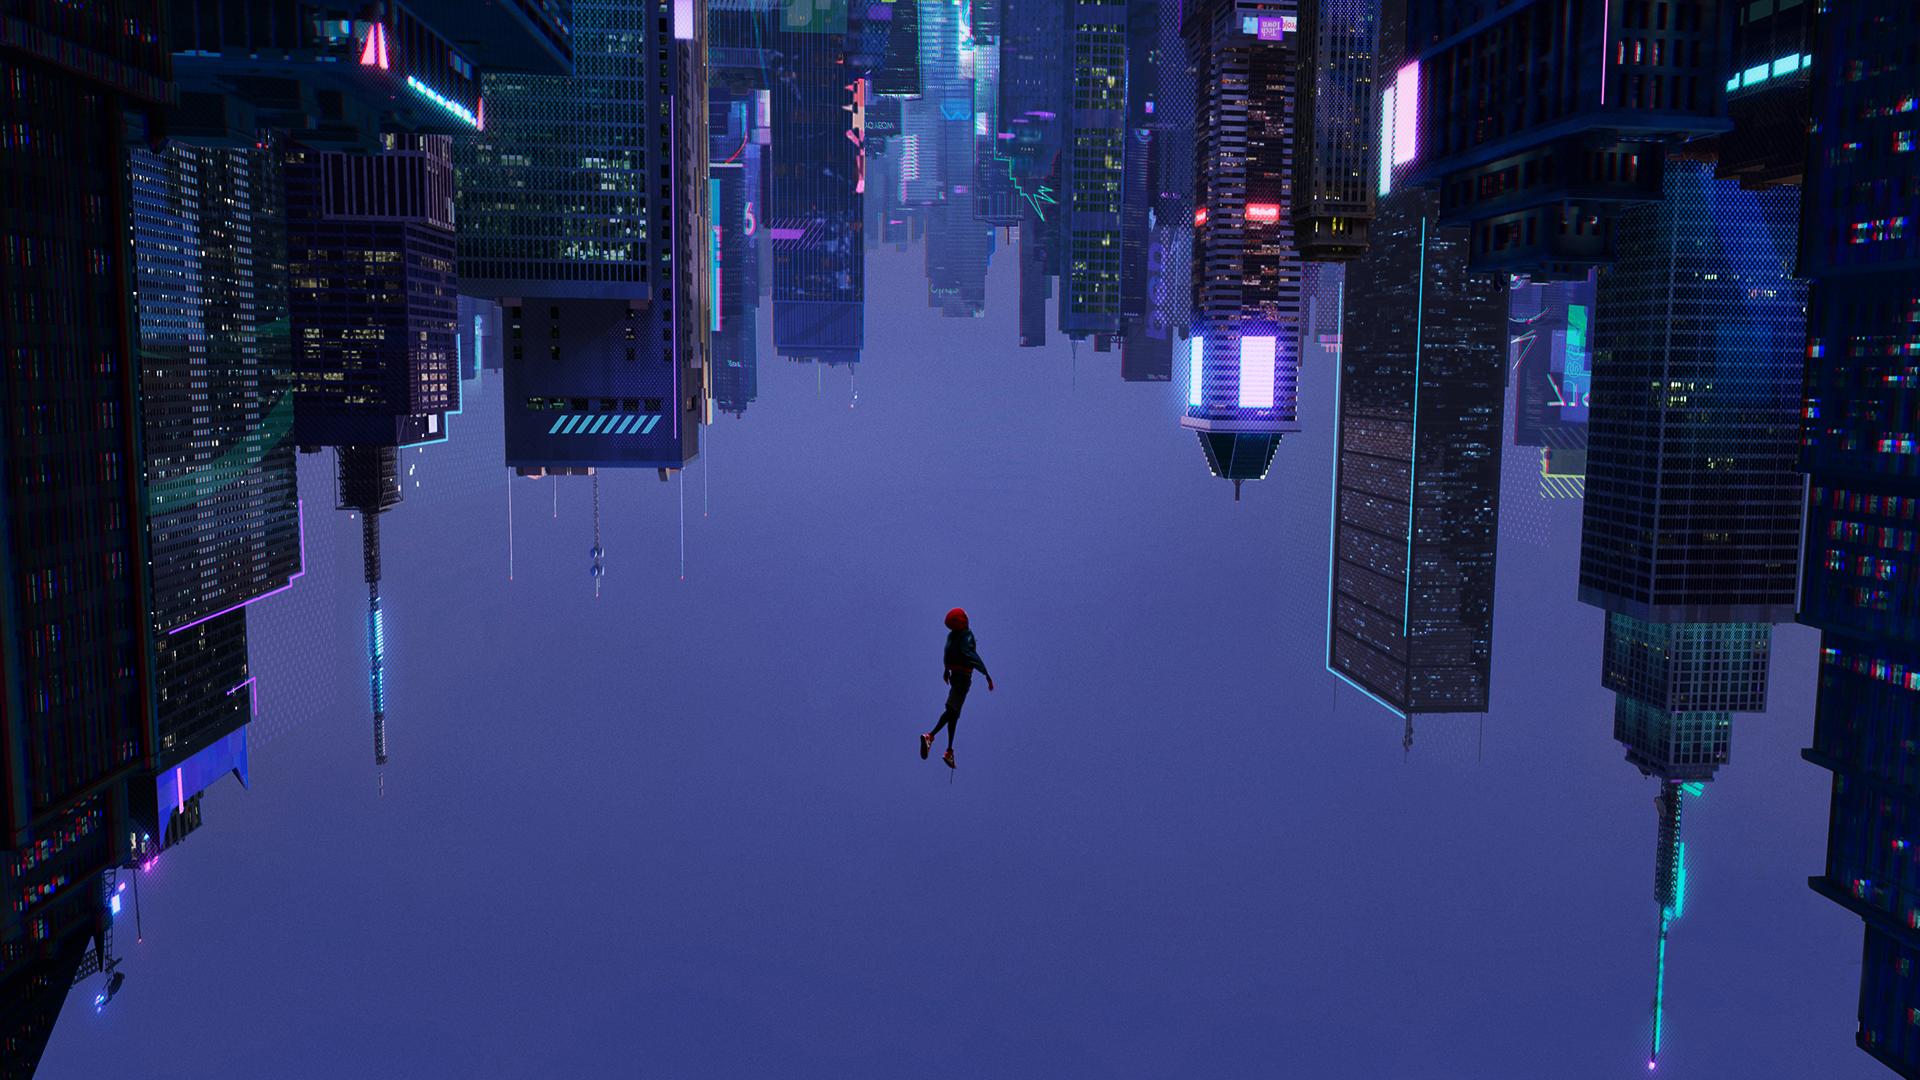 Into The Spider Verse Screenshot Wallpapers Desktop Wallpaper Art Superhero Wallpaper Aesthetic Desktop Wallpaper